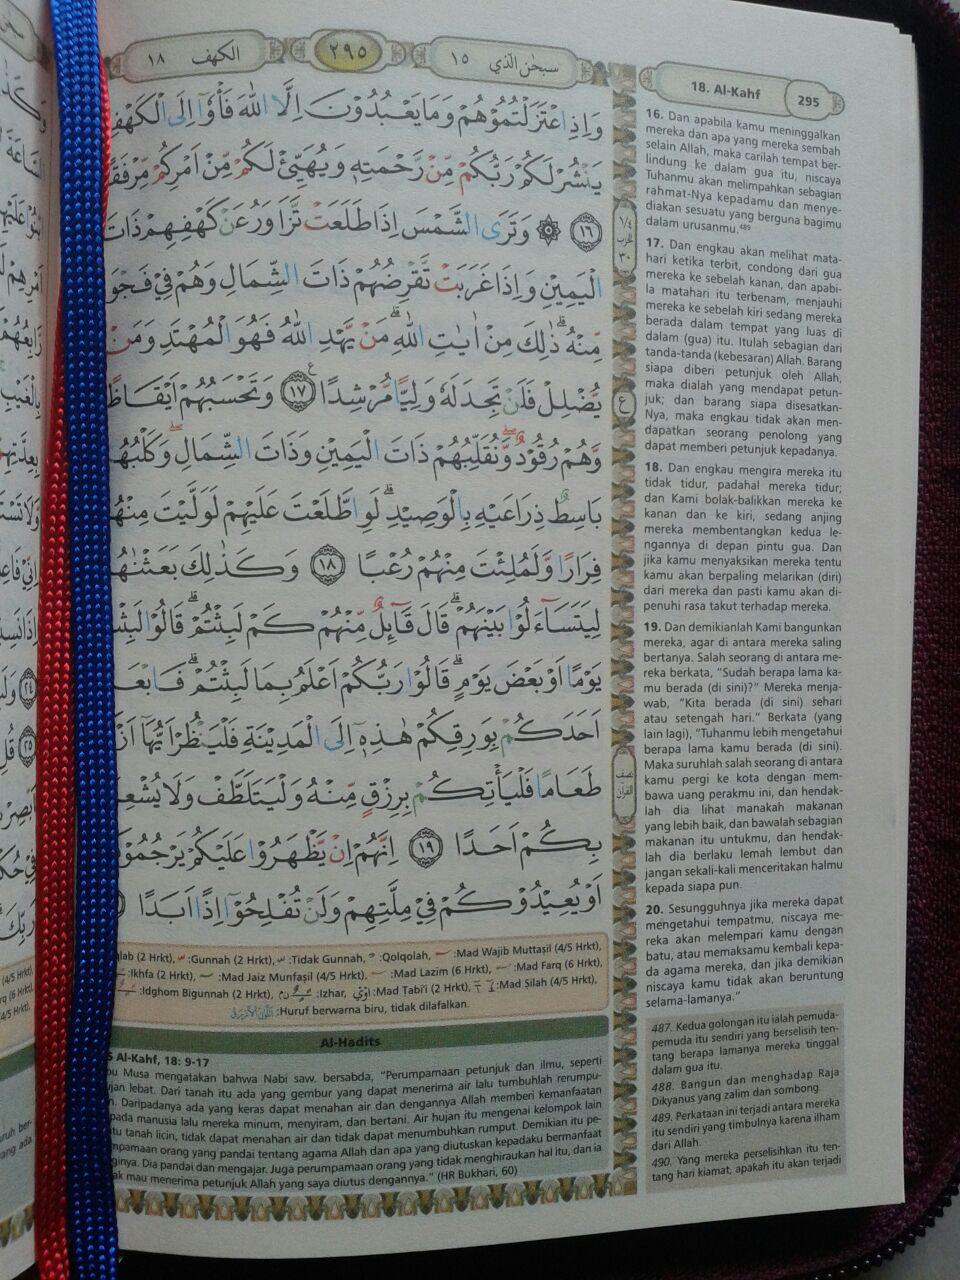 Al-Qur'an Terjemah Bukhara Syamil Ritsleting Tajwid Ukuran A6 isi